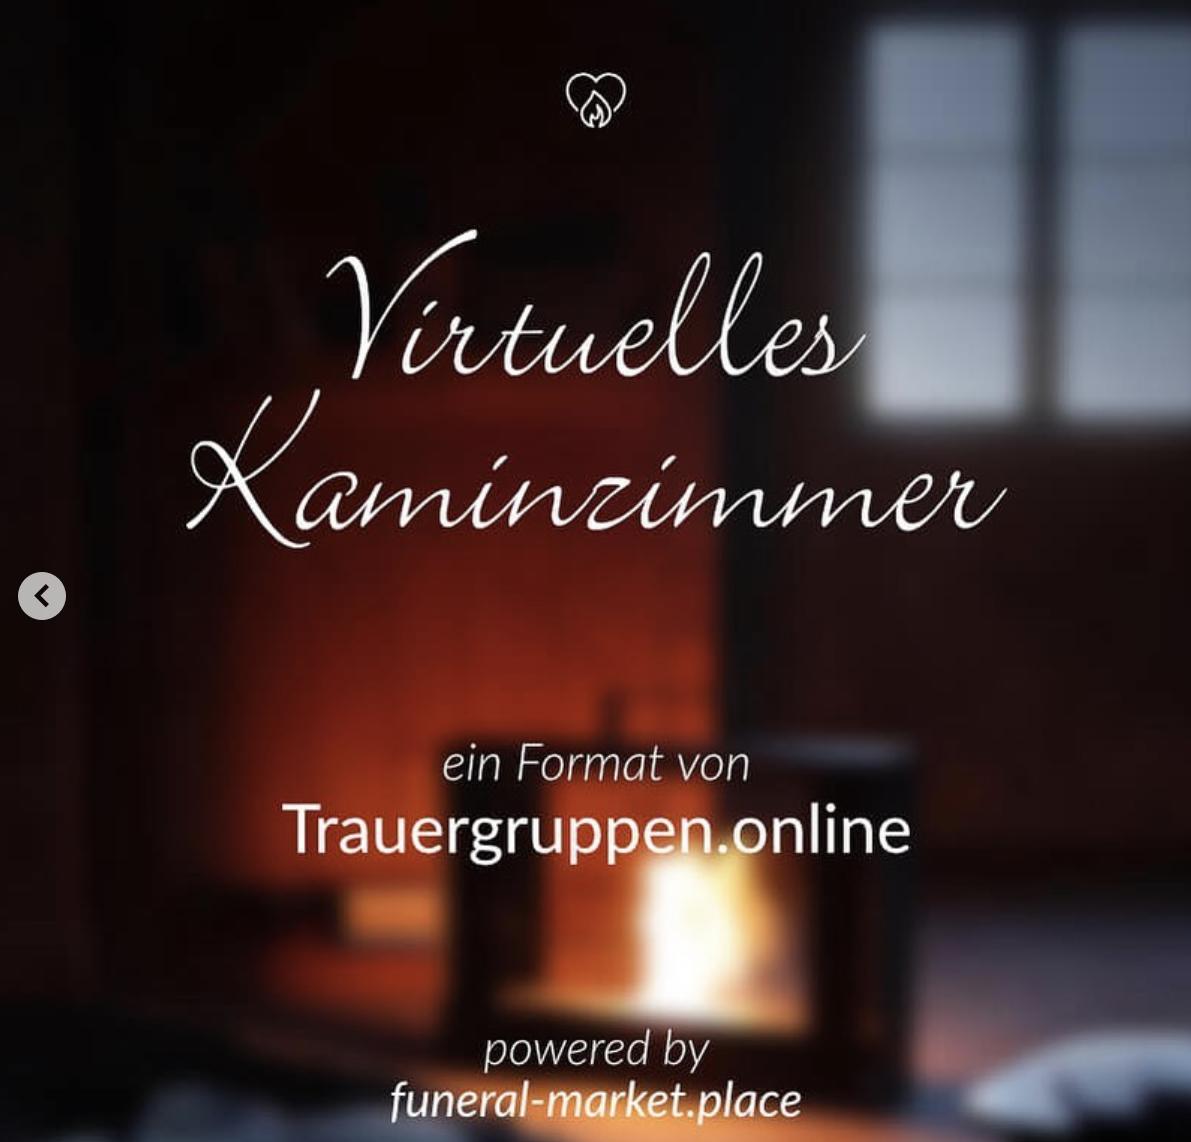 Virtuelles Kaminzimmer